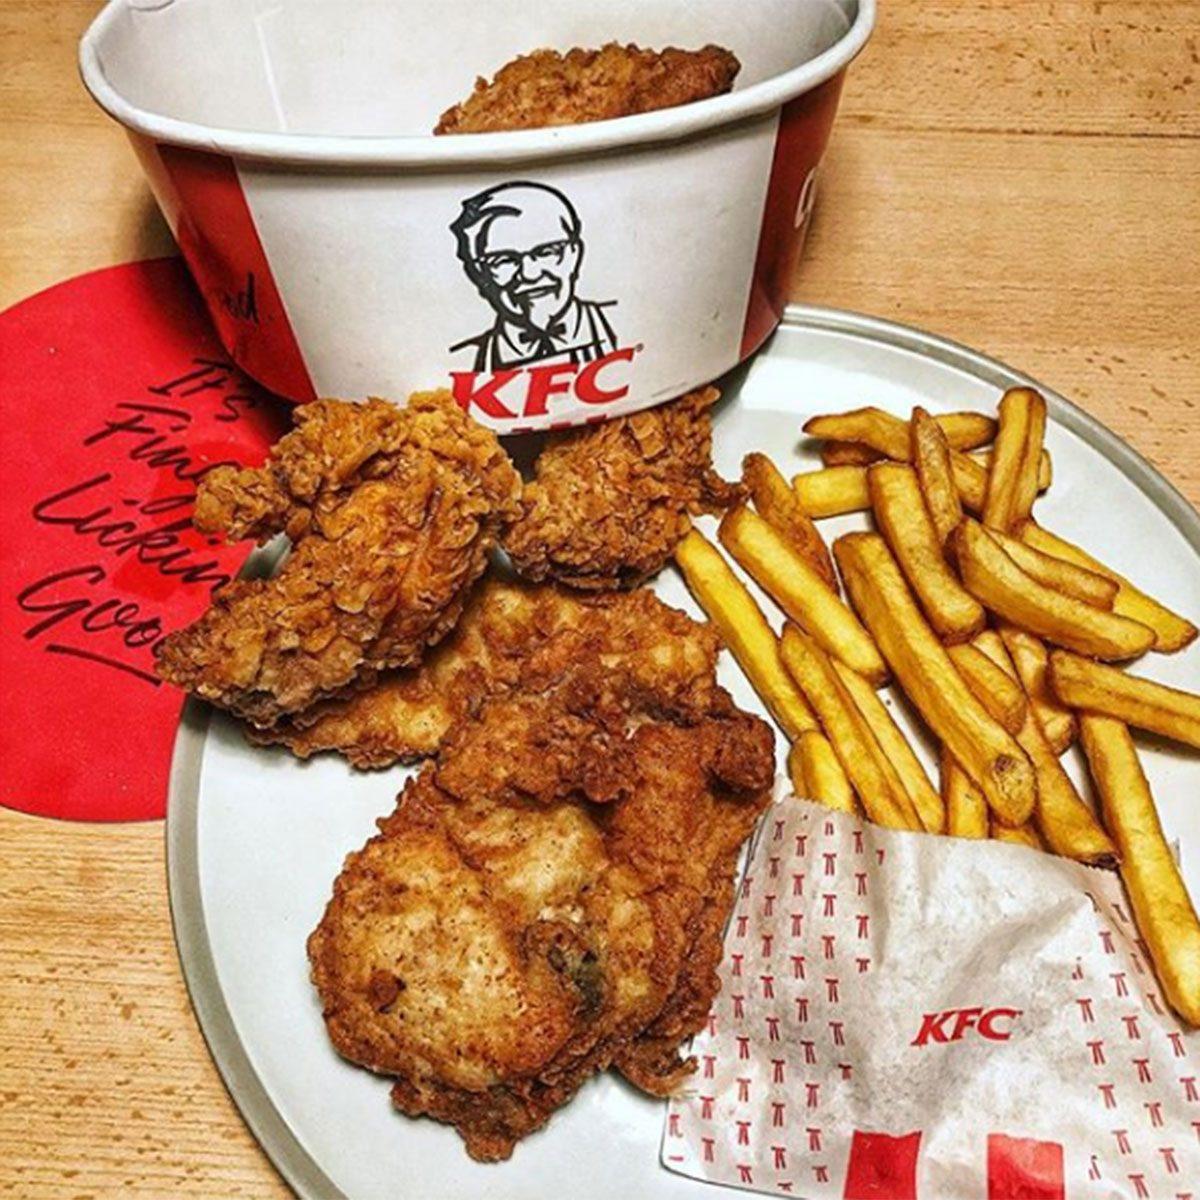 KFC chicken and fries